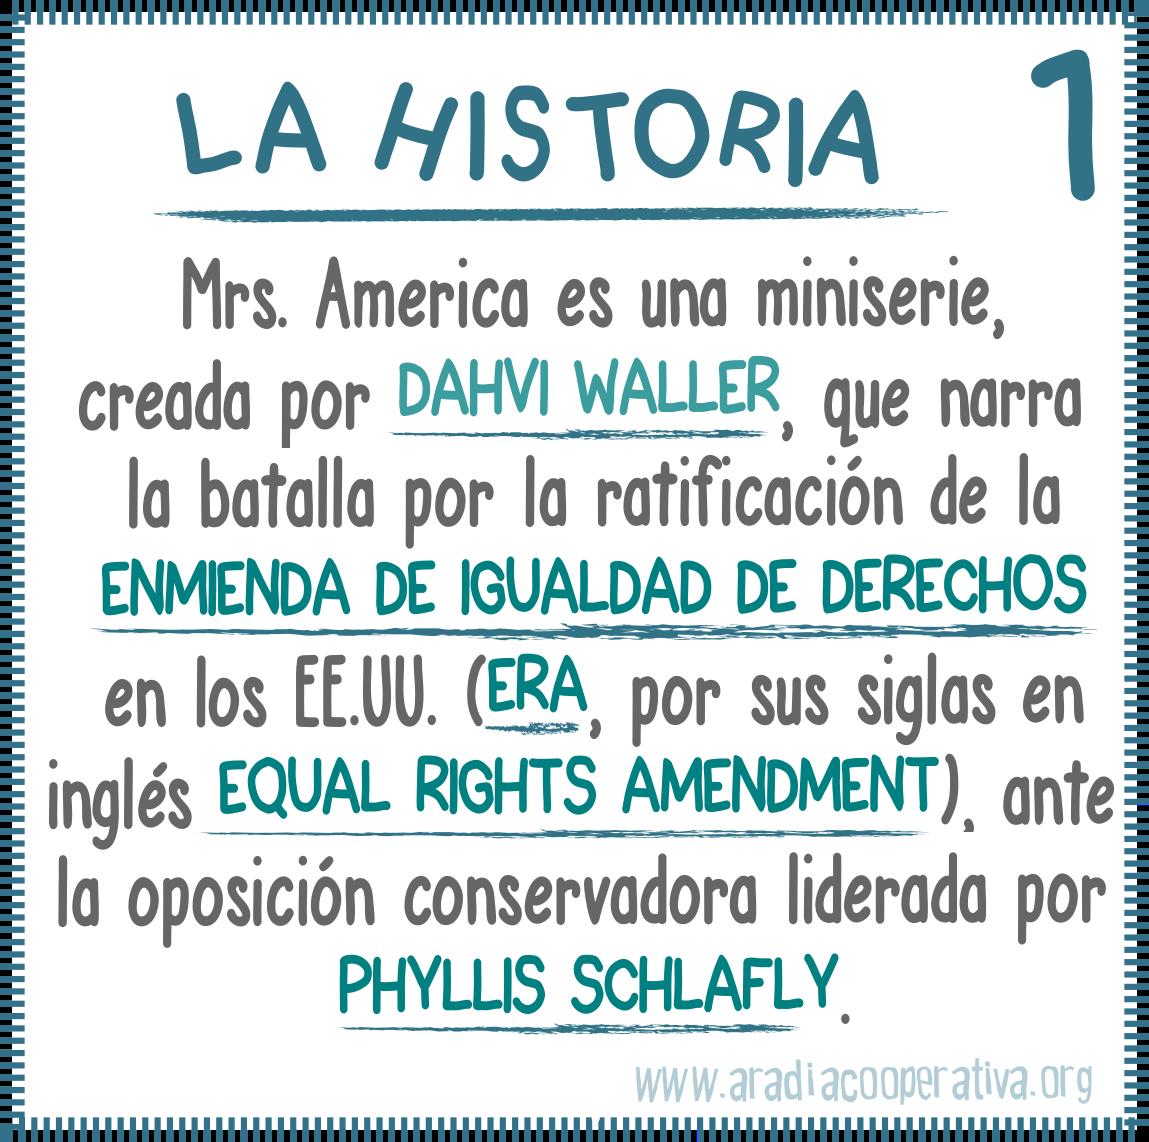 1. La historia